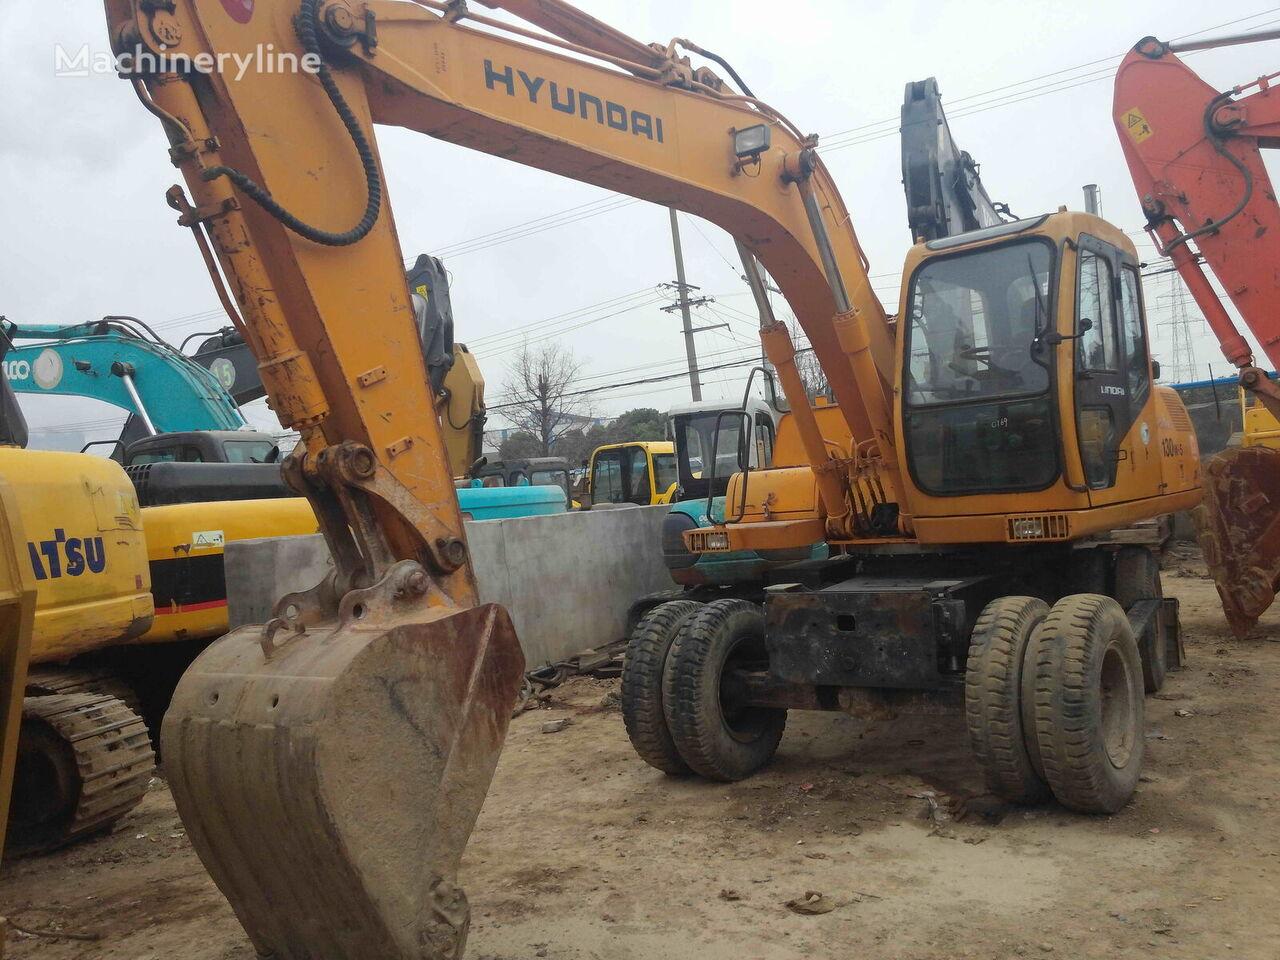 HYUNDAI Good condition 130W-5 wheel excavator